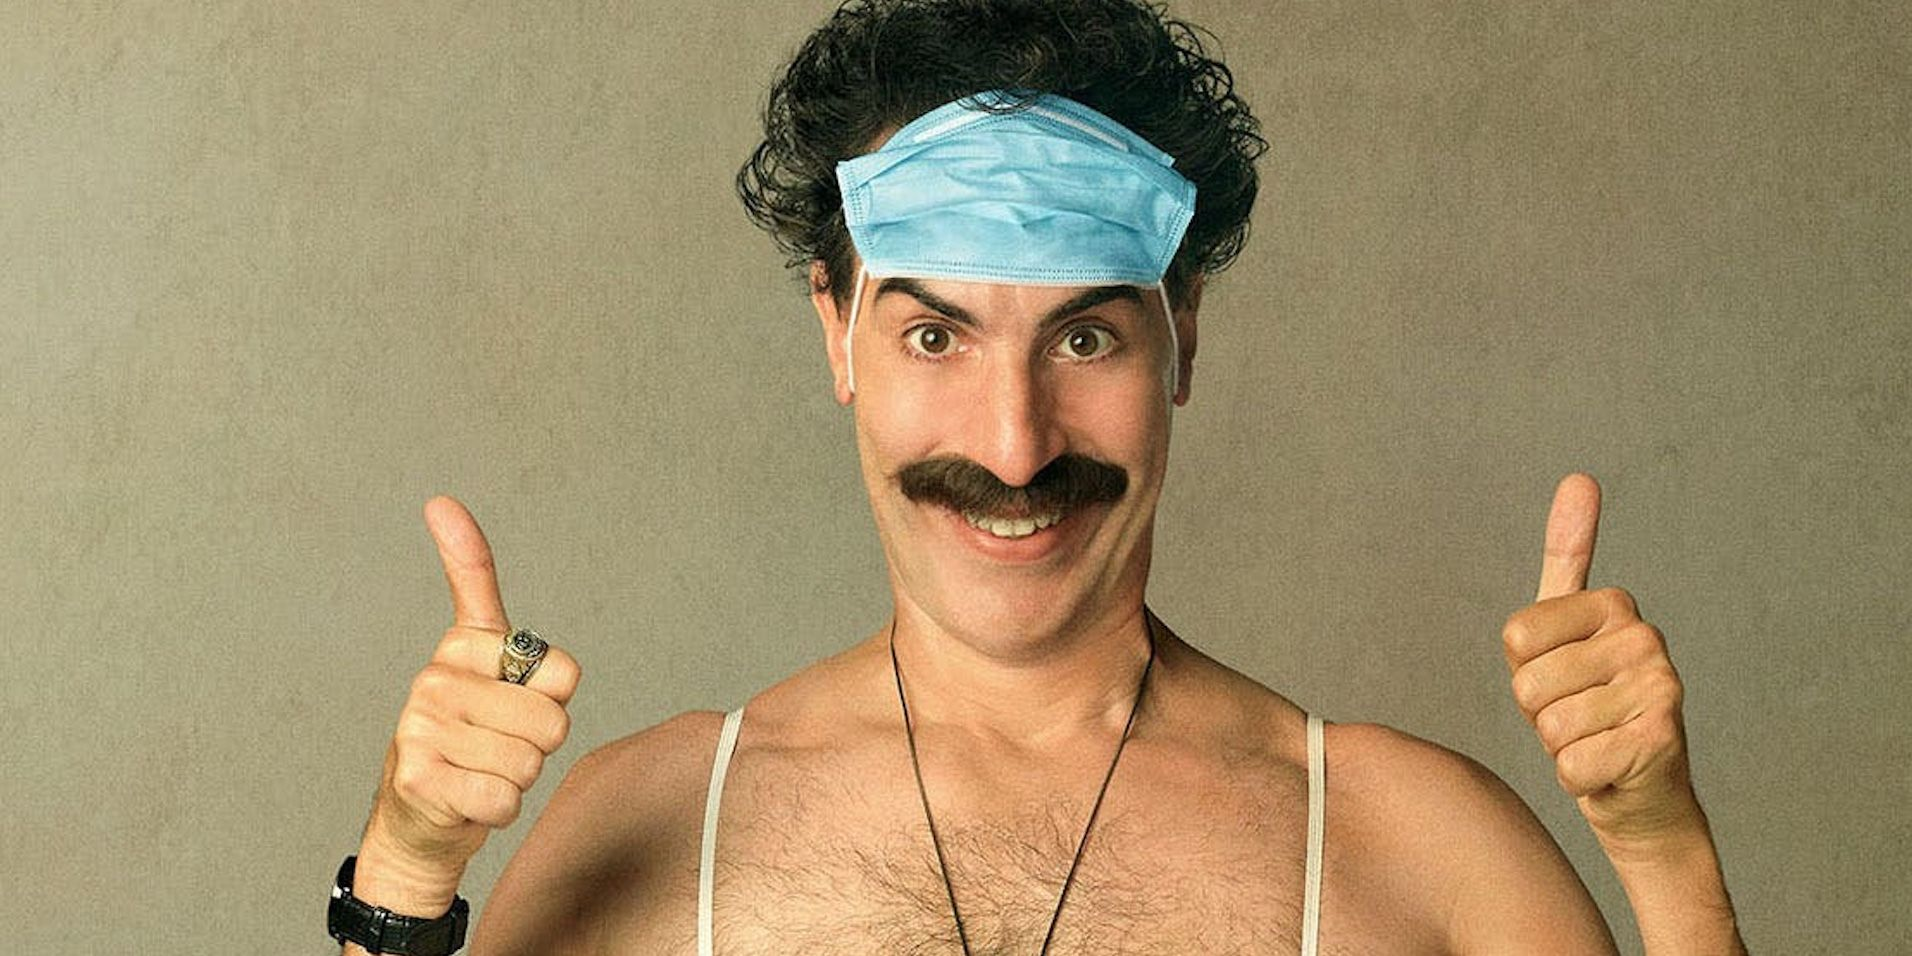 Borat 2: todas as celebridades mencionadas e zombadas 9